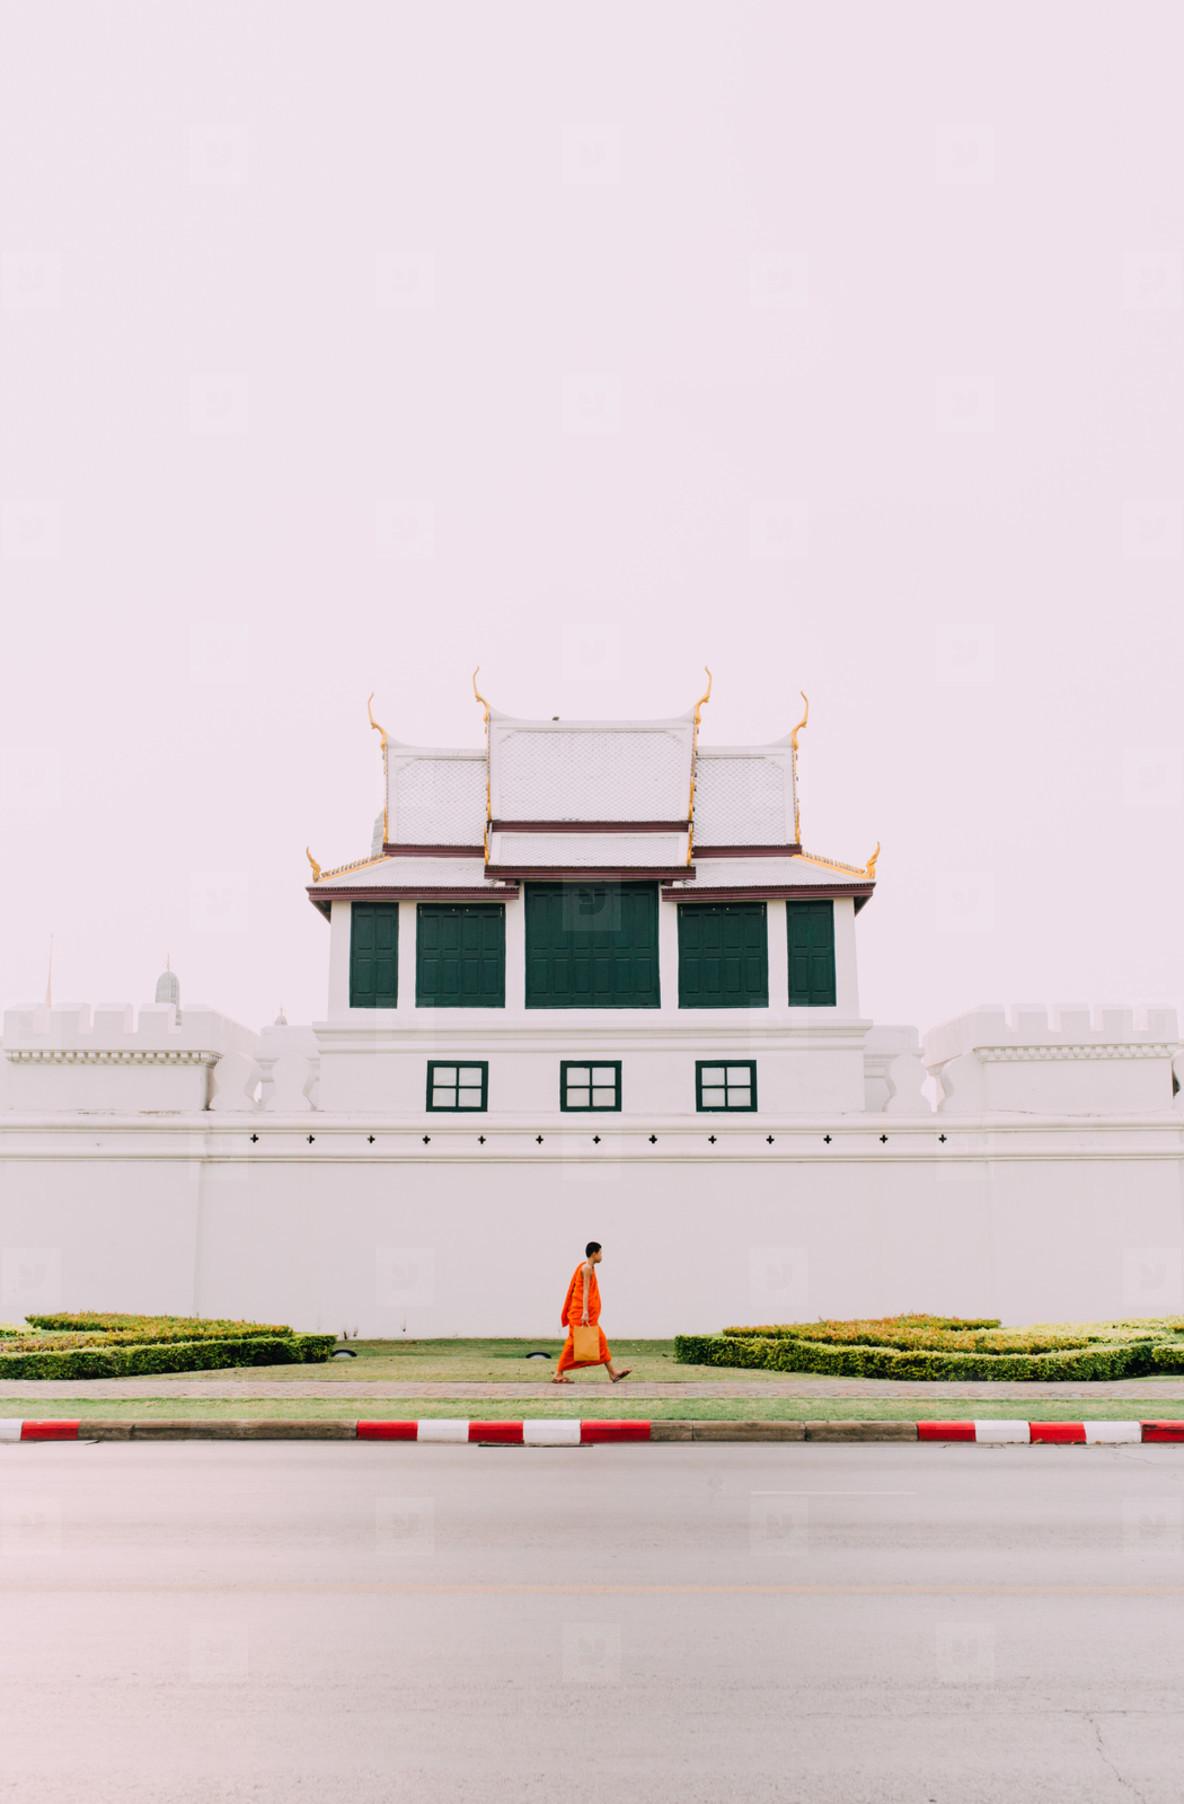 Monk walking pass temple